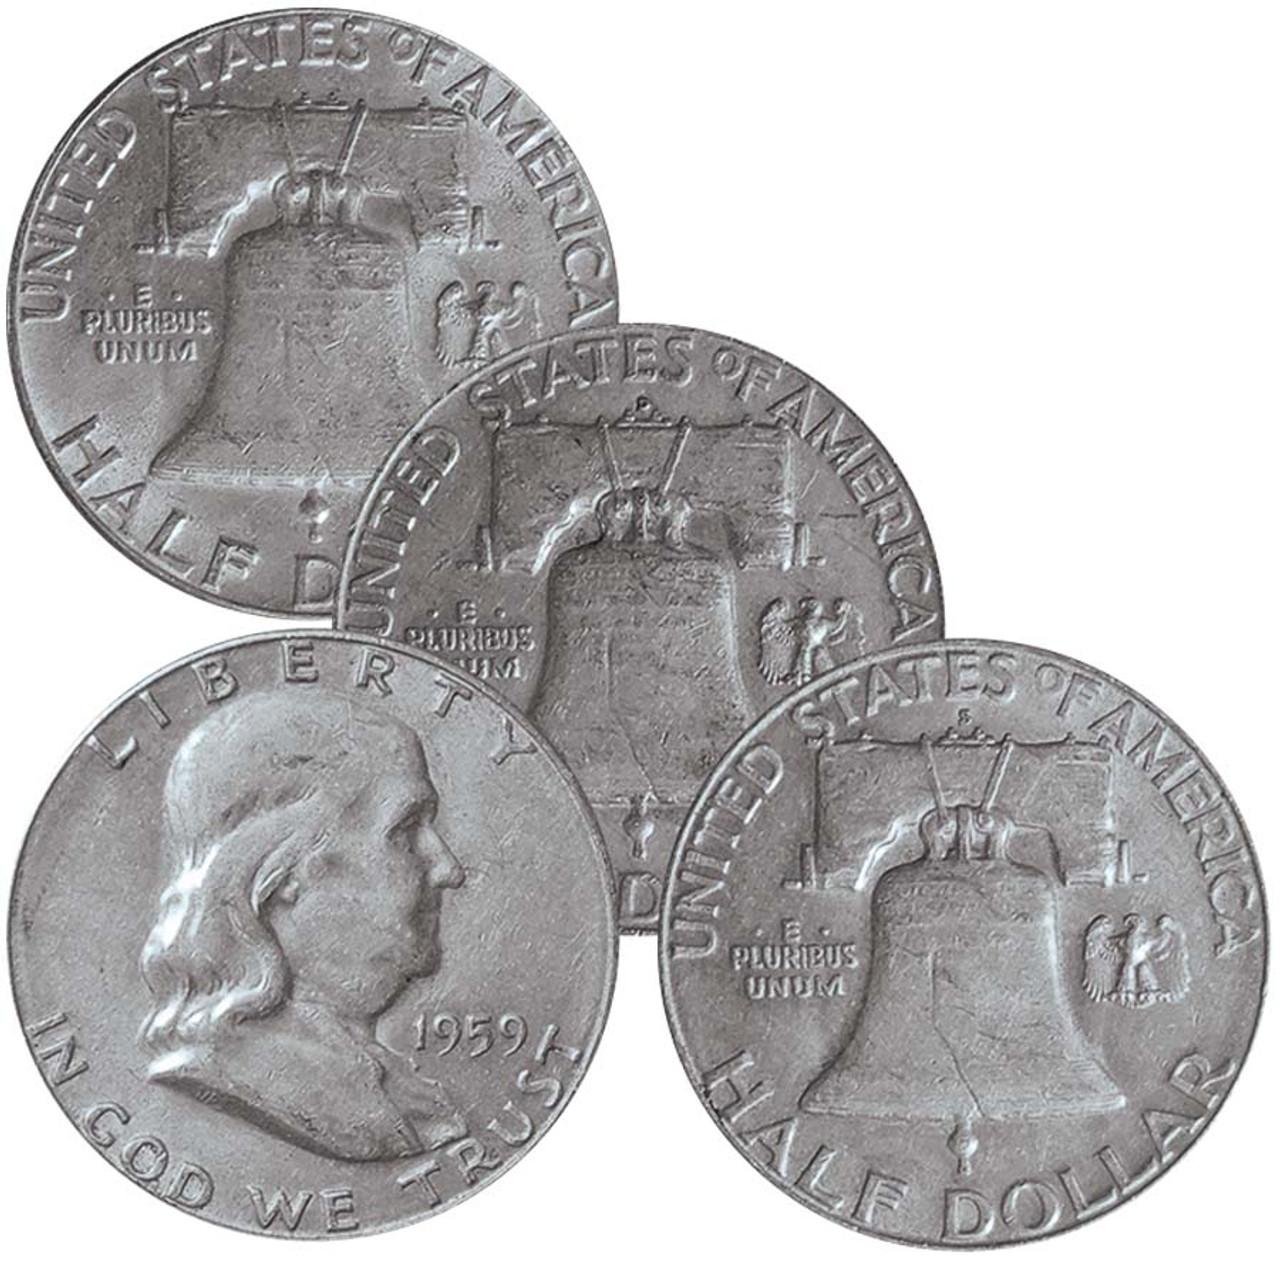 U.S. Franklin Half Dollars 1951PDS Very Fine